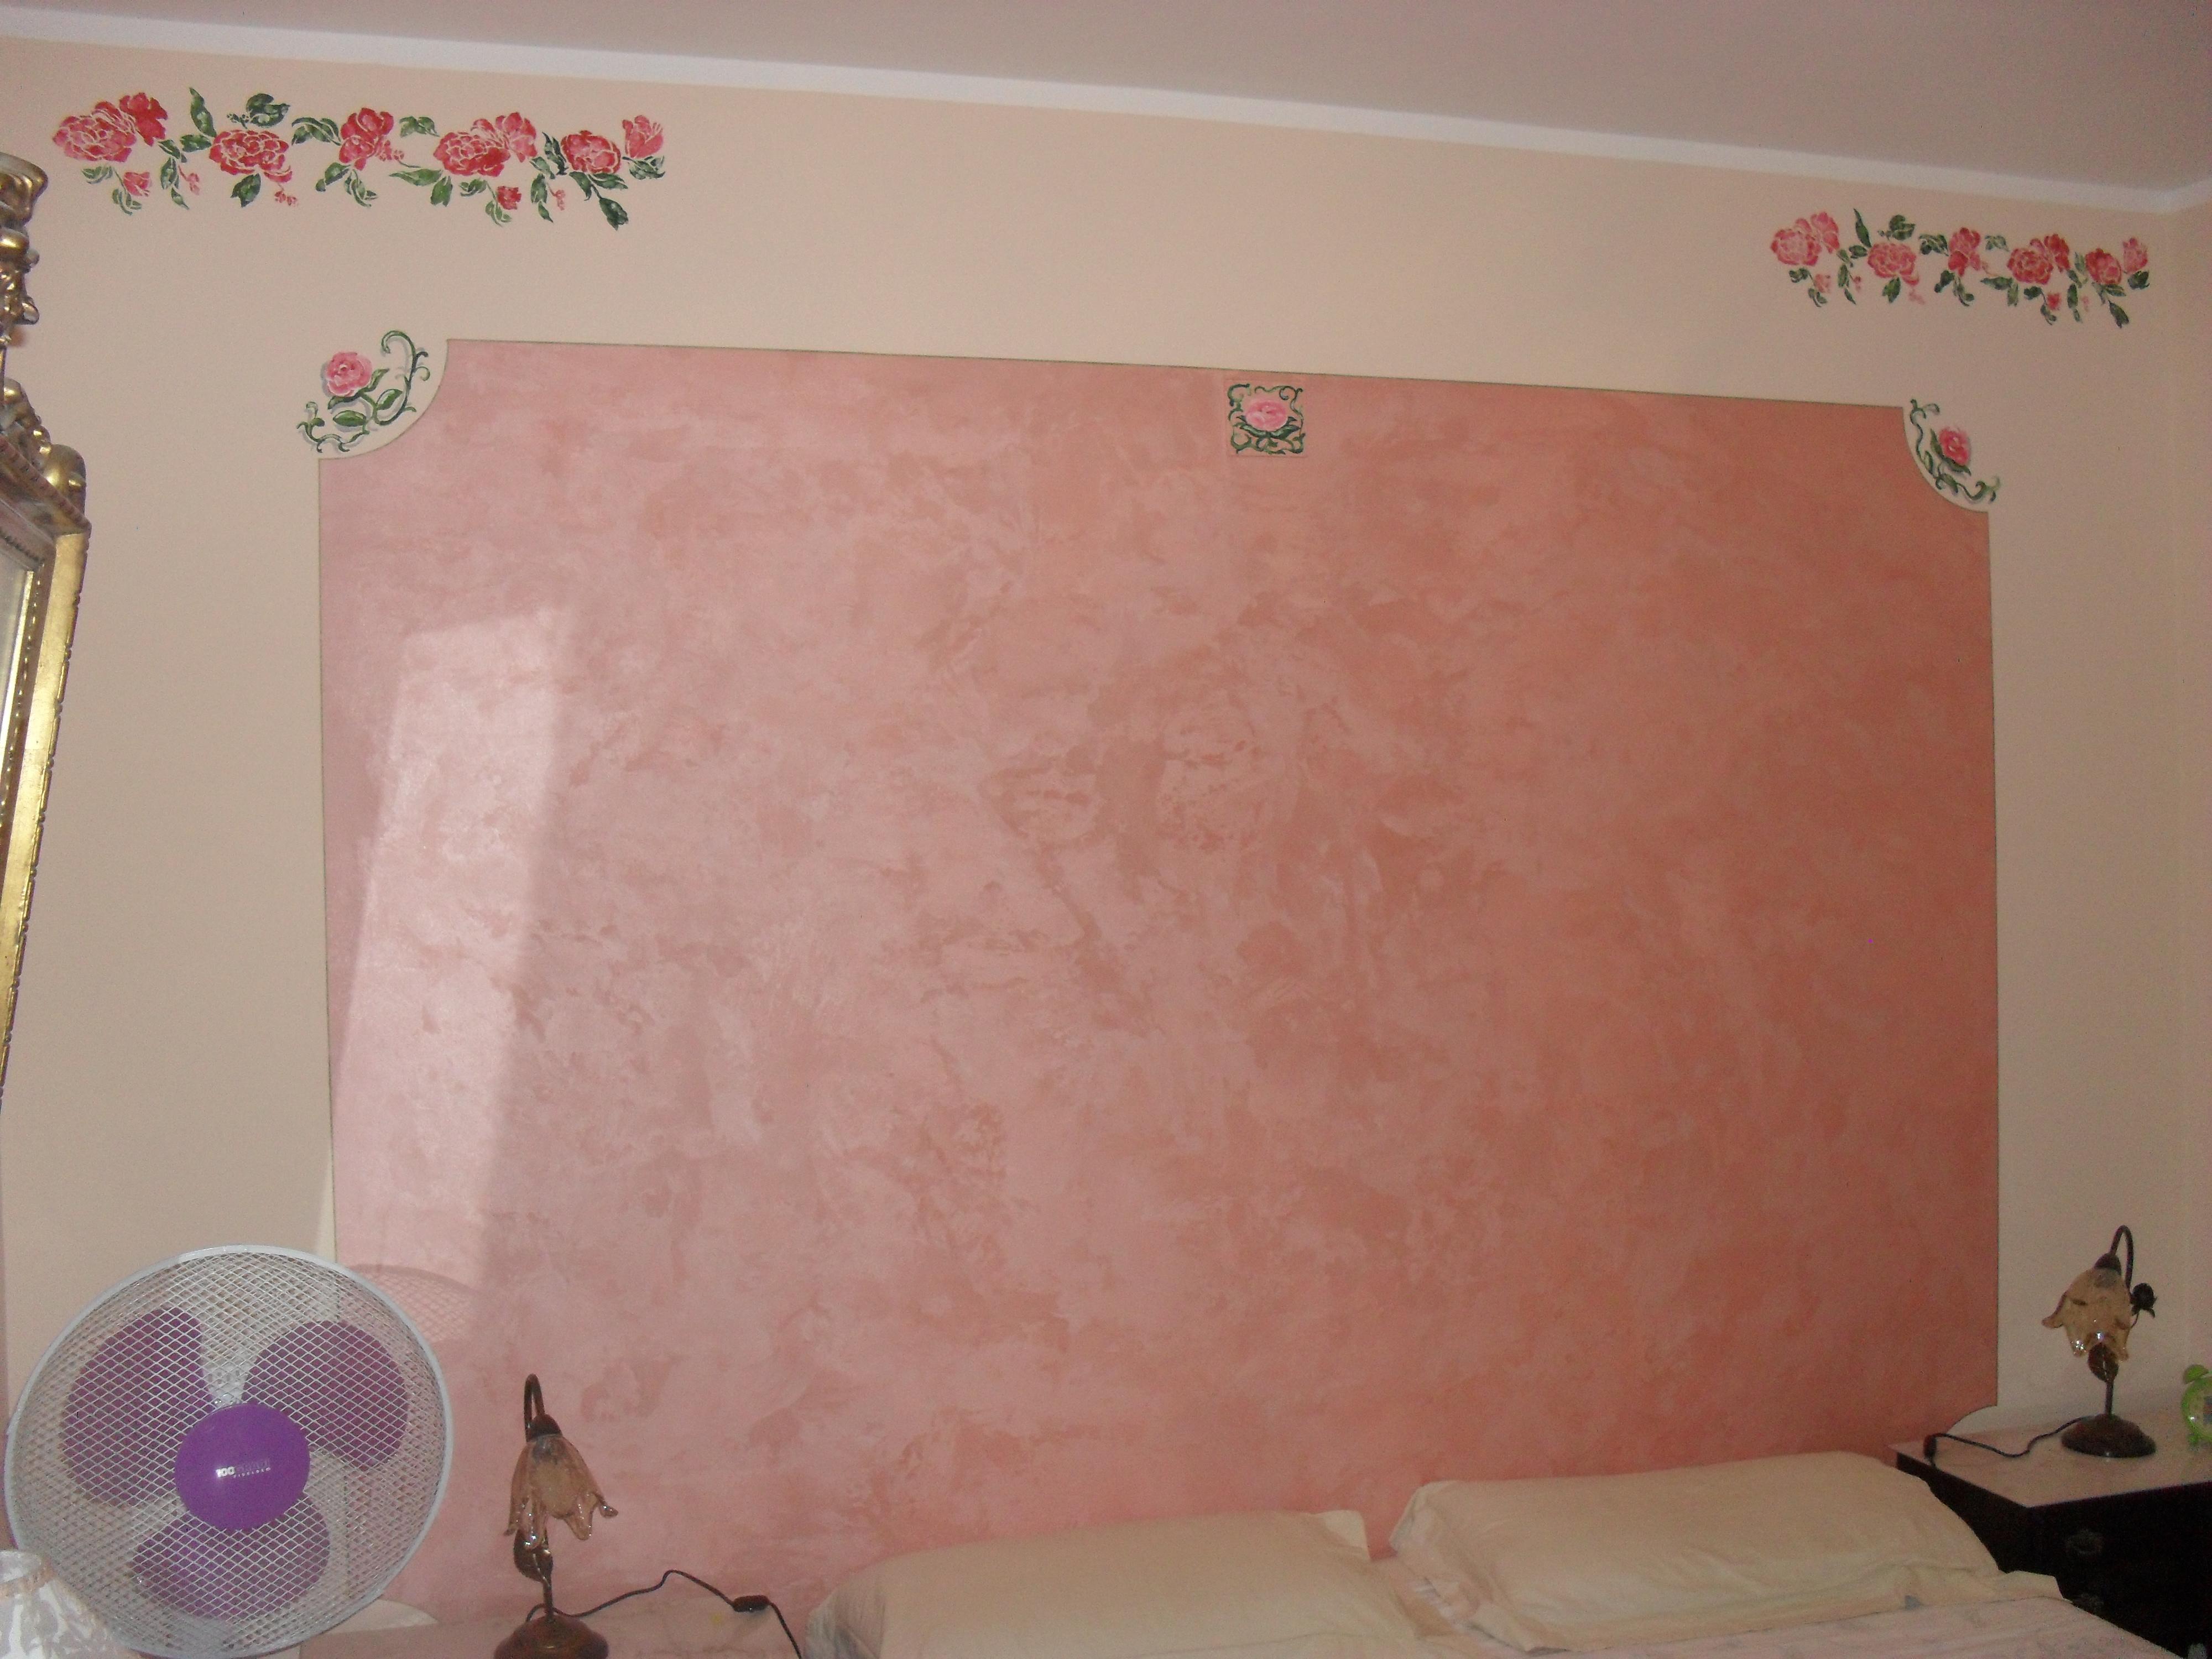 Pittura Pareti Effetto Seta : Pittura metallizzata per pareti prezzi pareti effetto sabbia